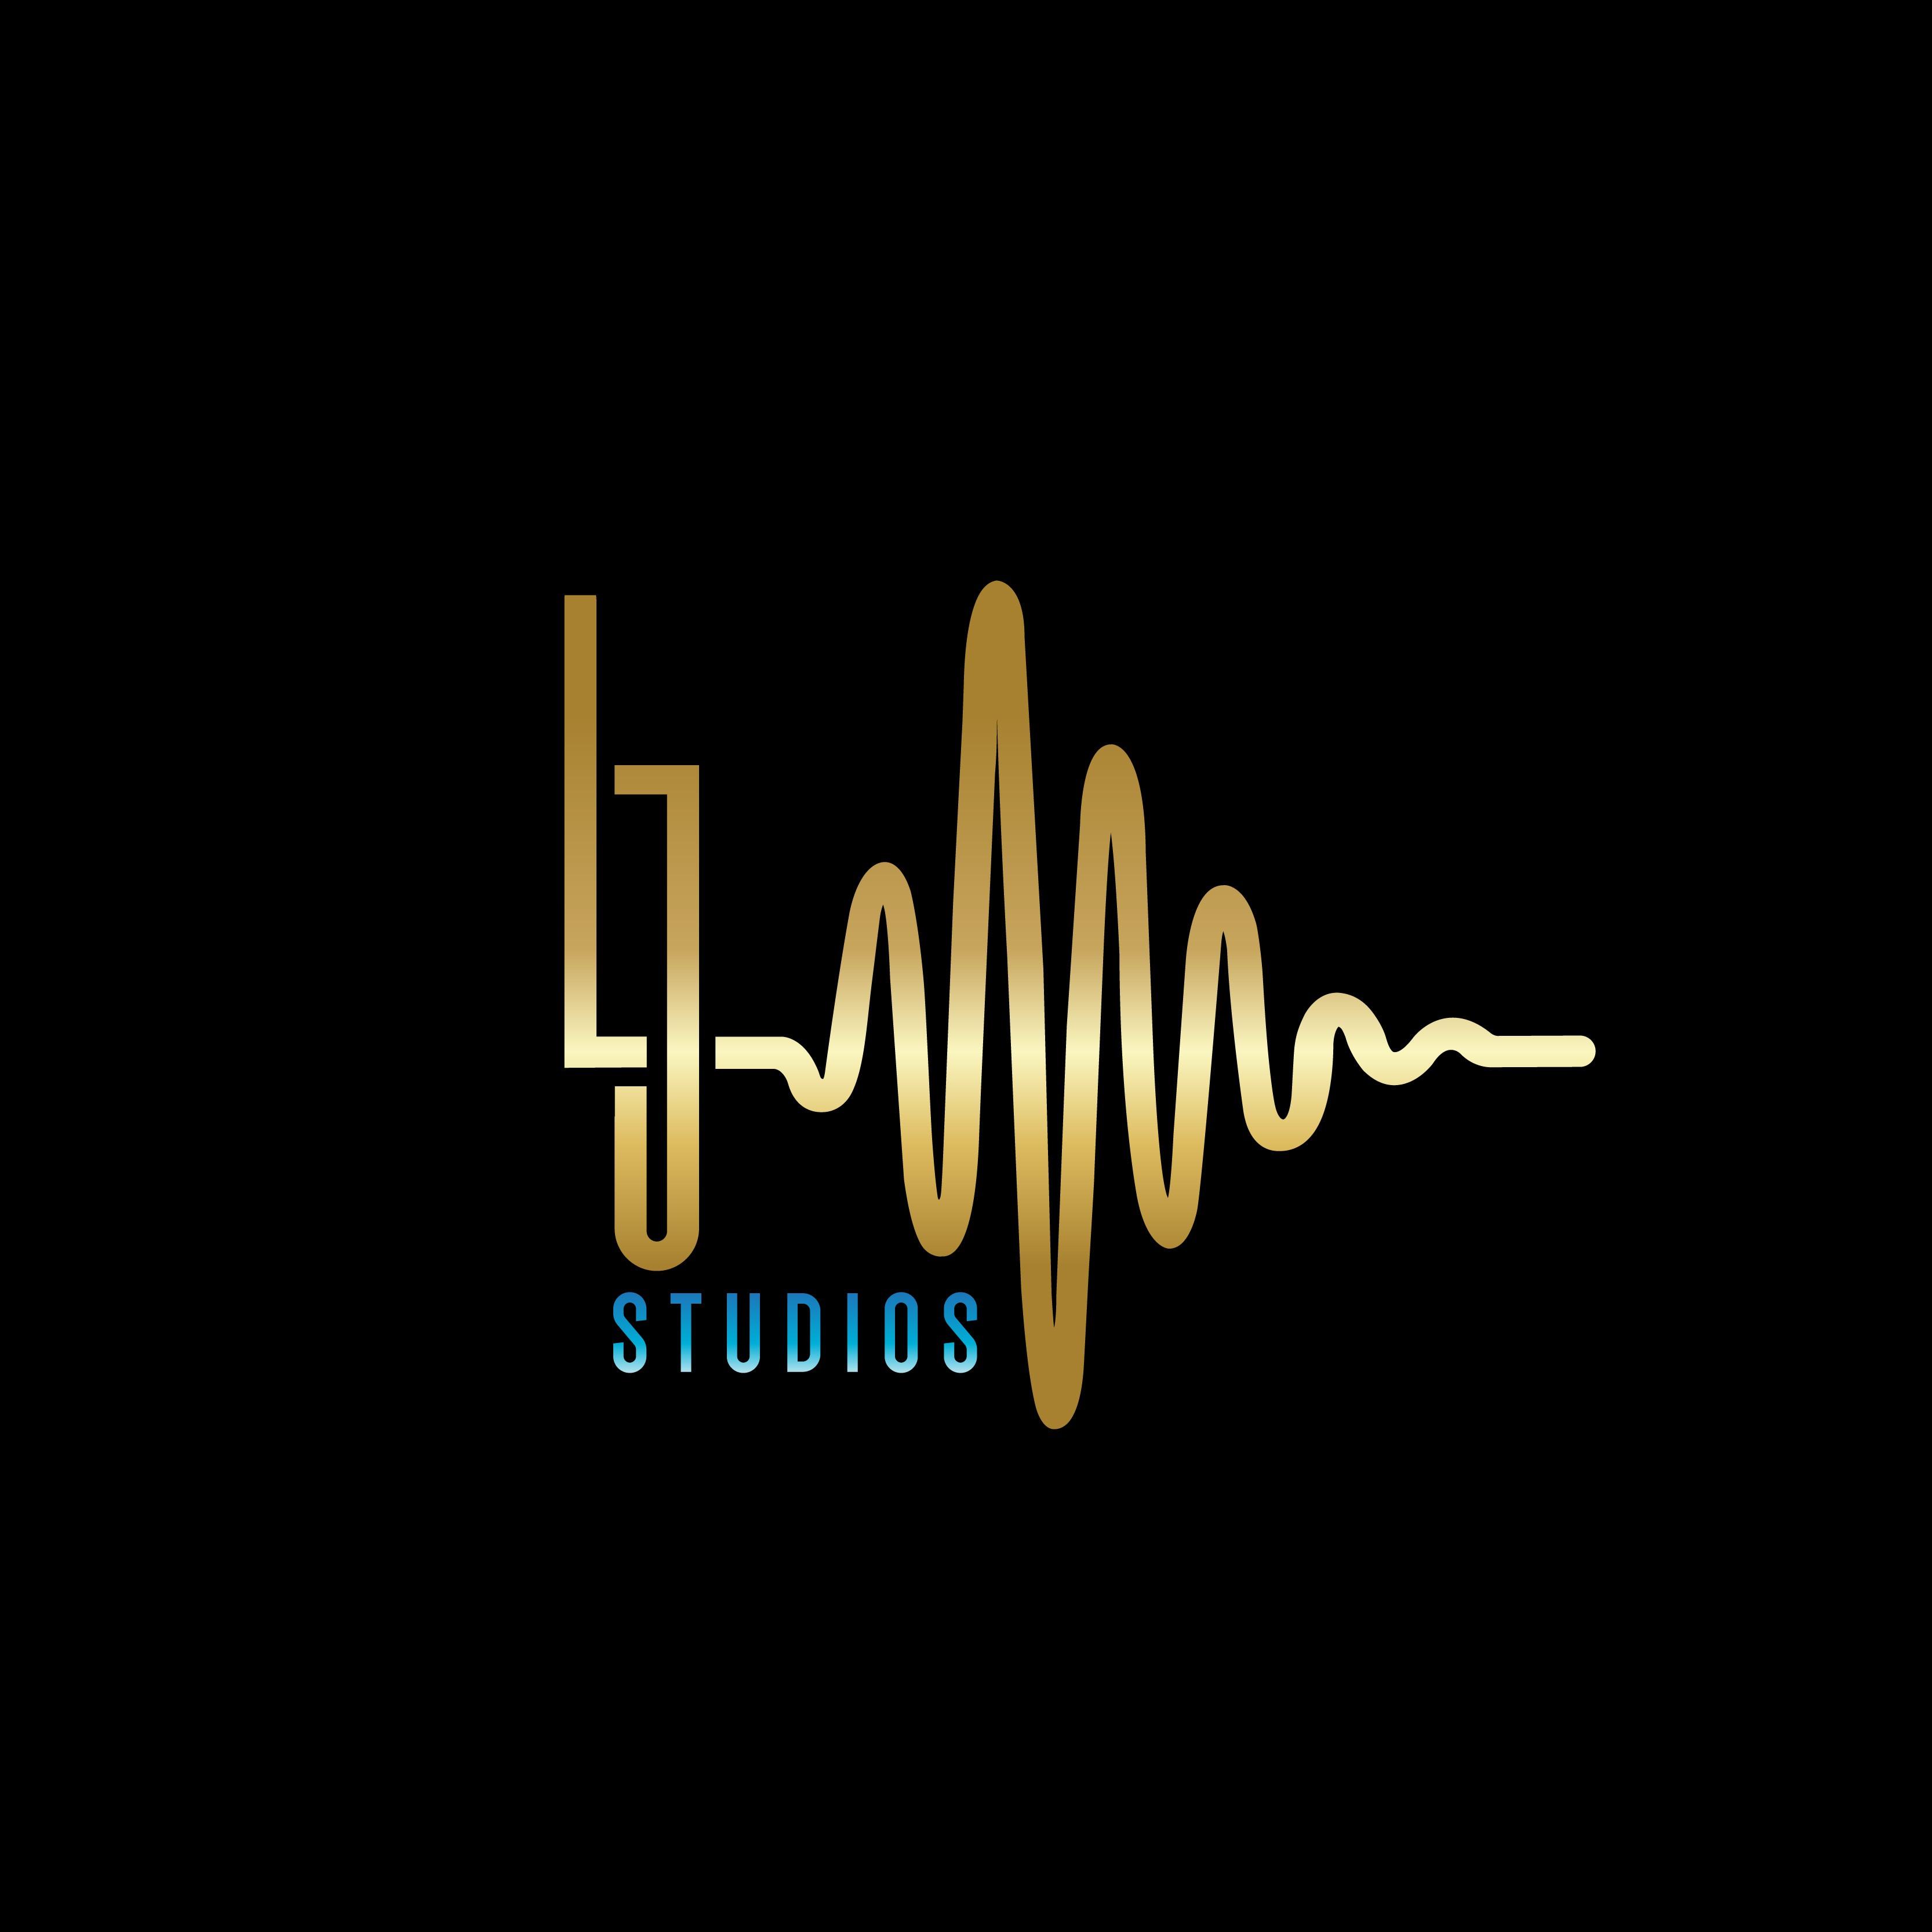 New Film Sound Studio needs unique logo